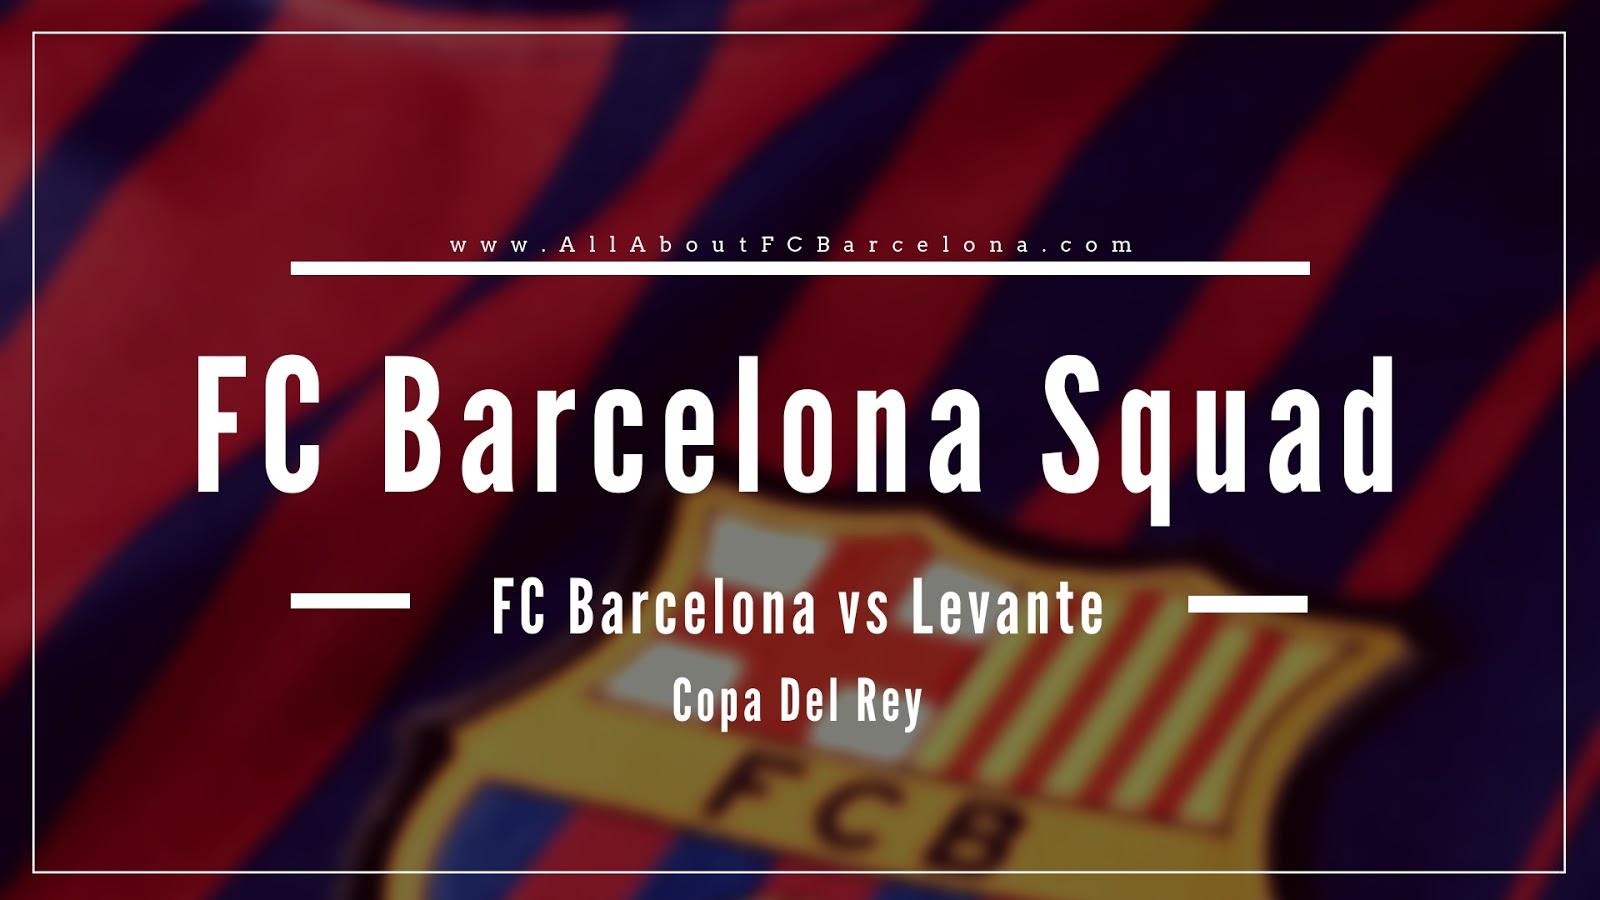 FC Barcelona Squad announced for Copa Del Rey Match against Levante